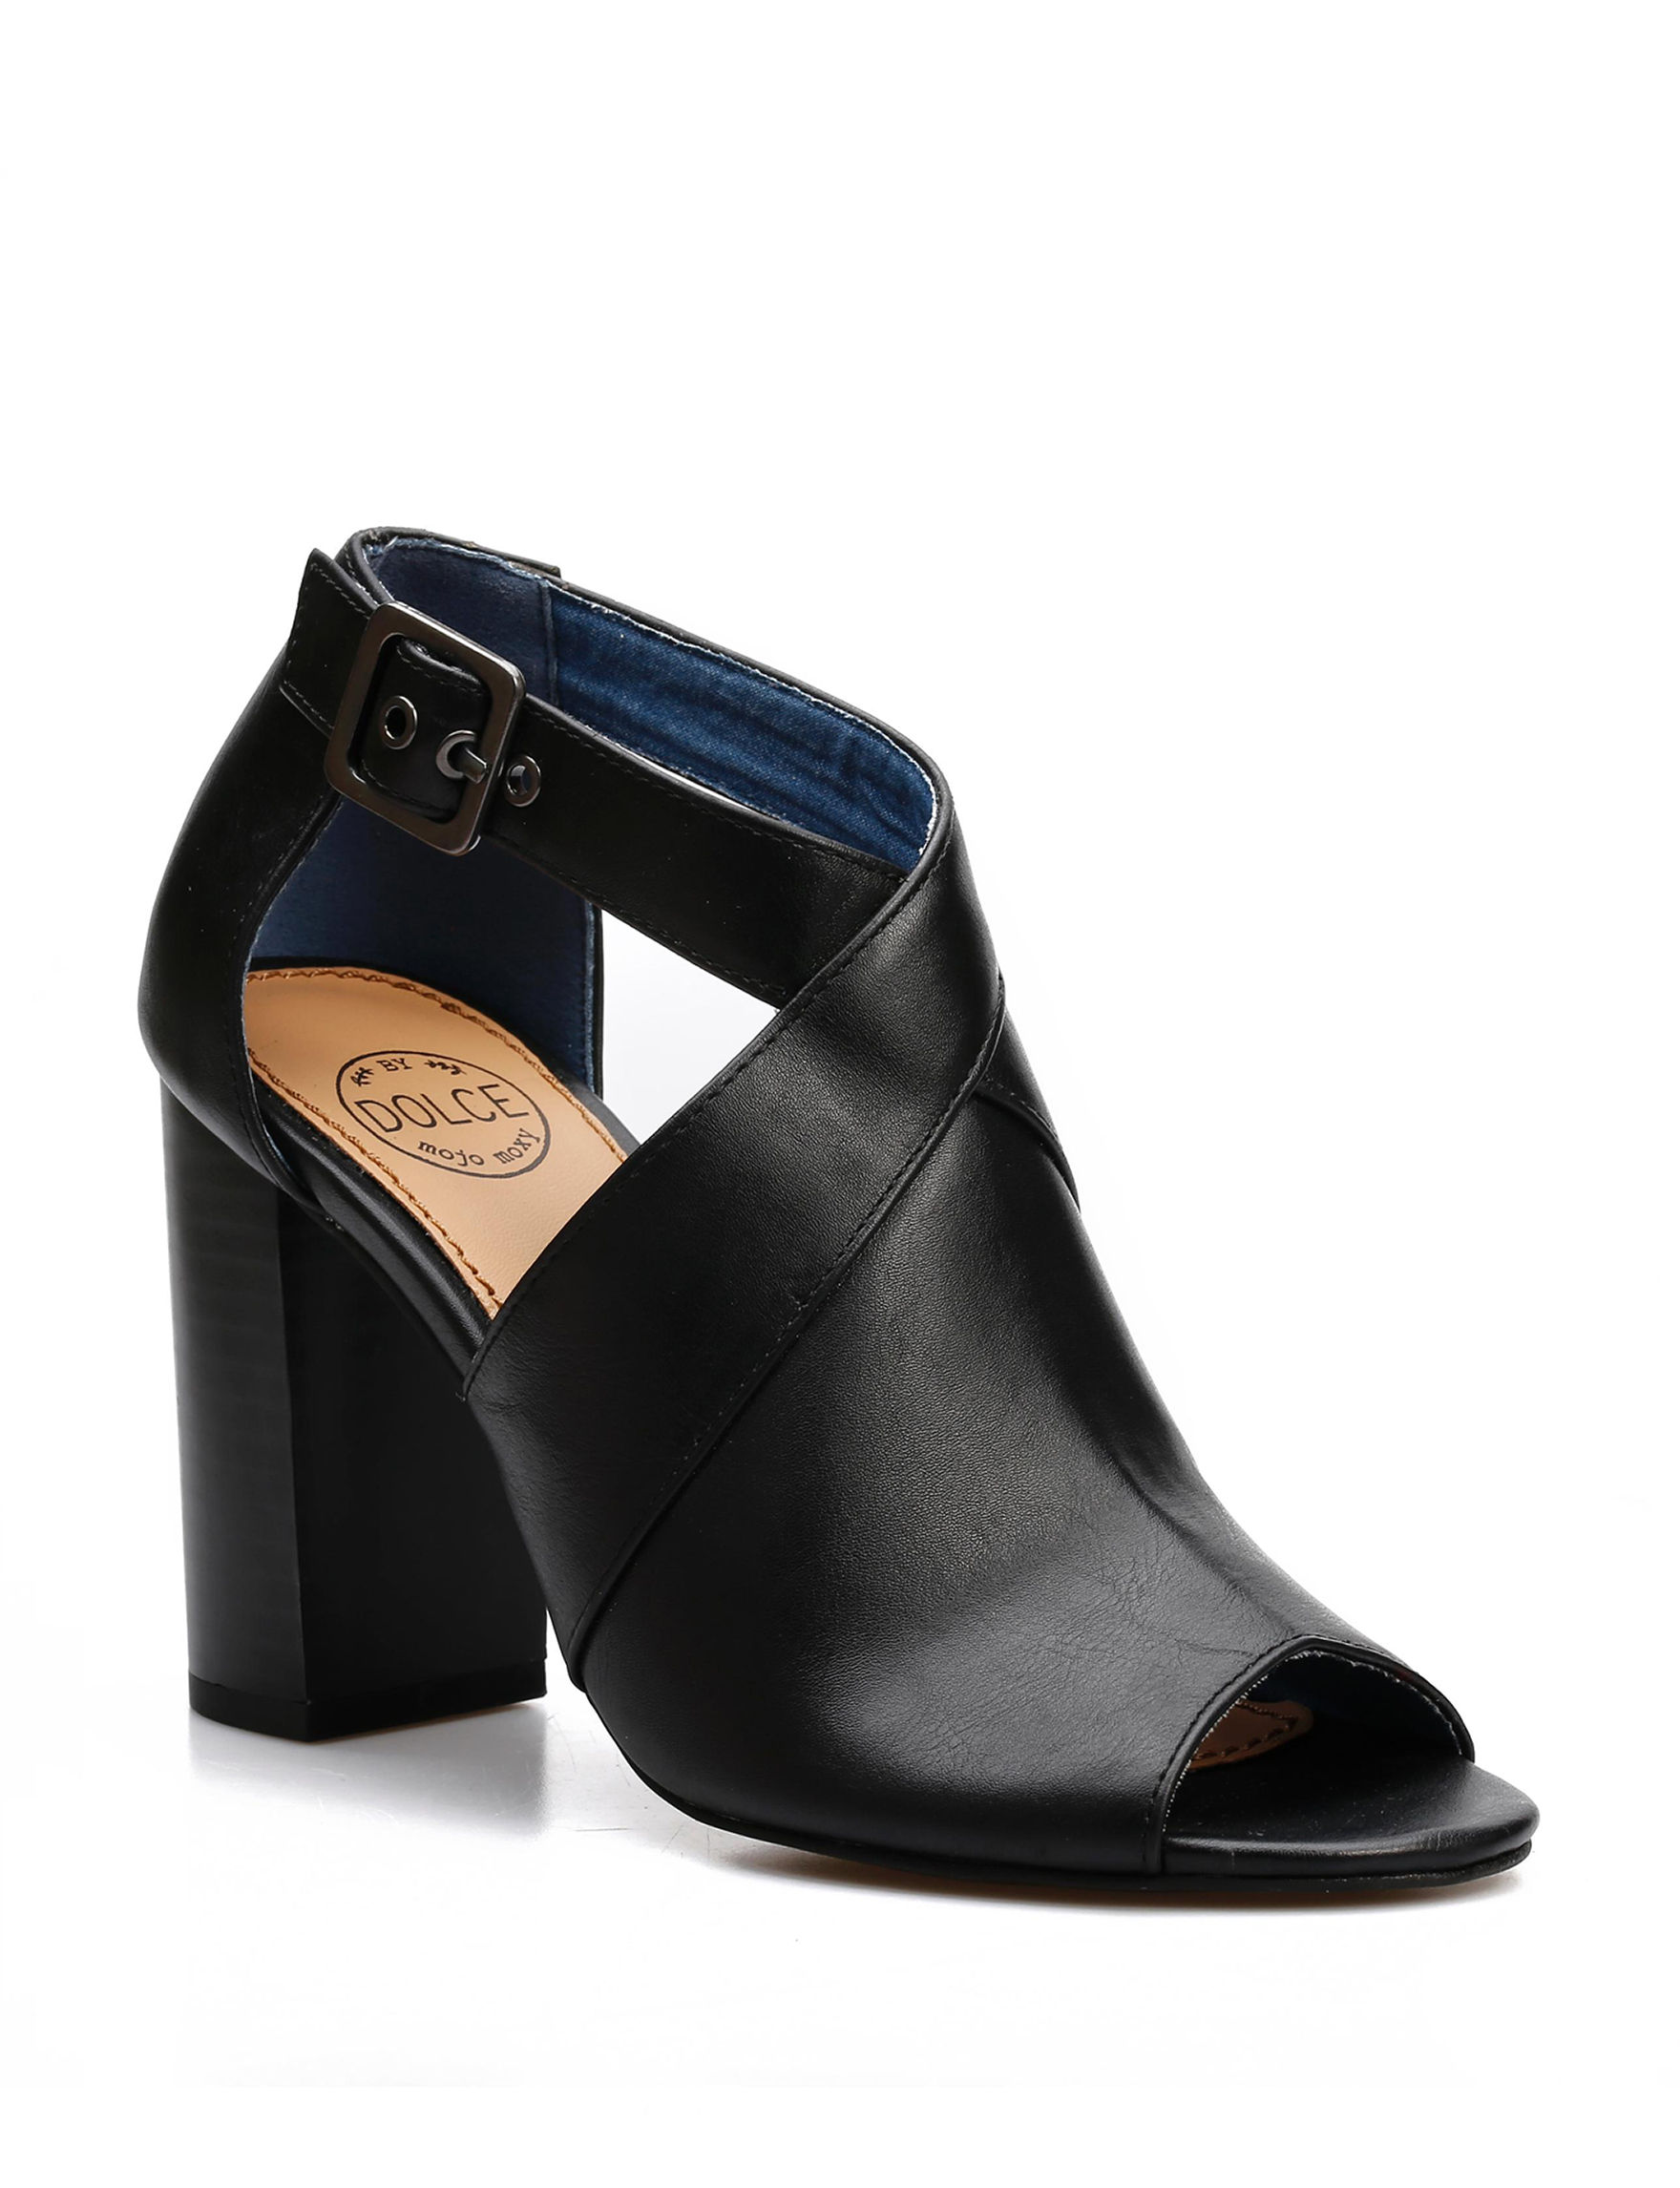 Dolce by Mojo Moxy Black Heeled Sandals Peep Toe